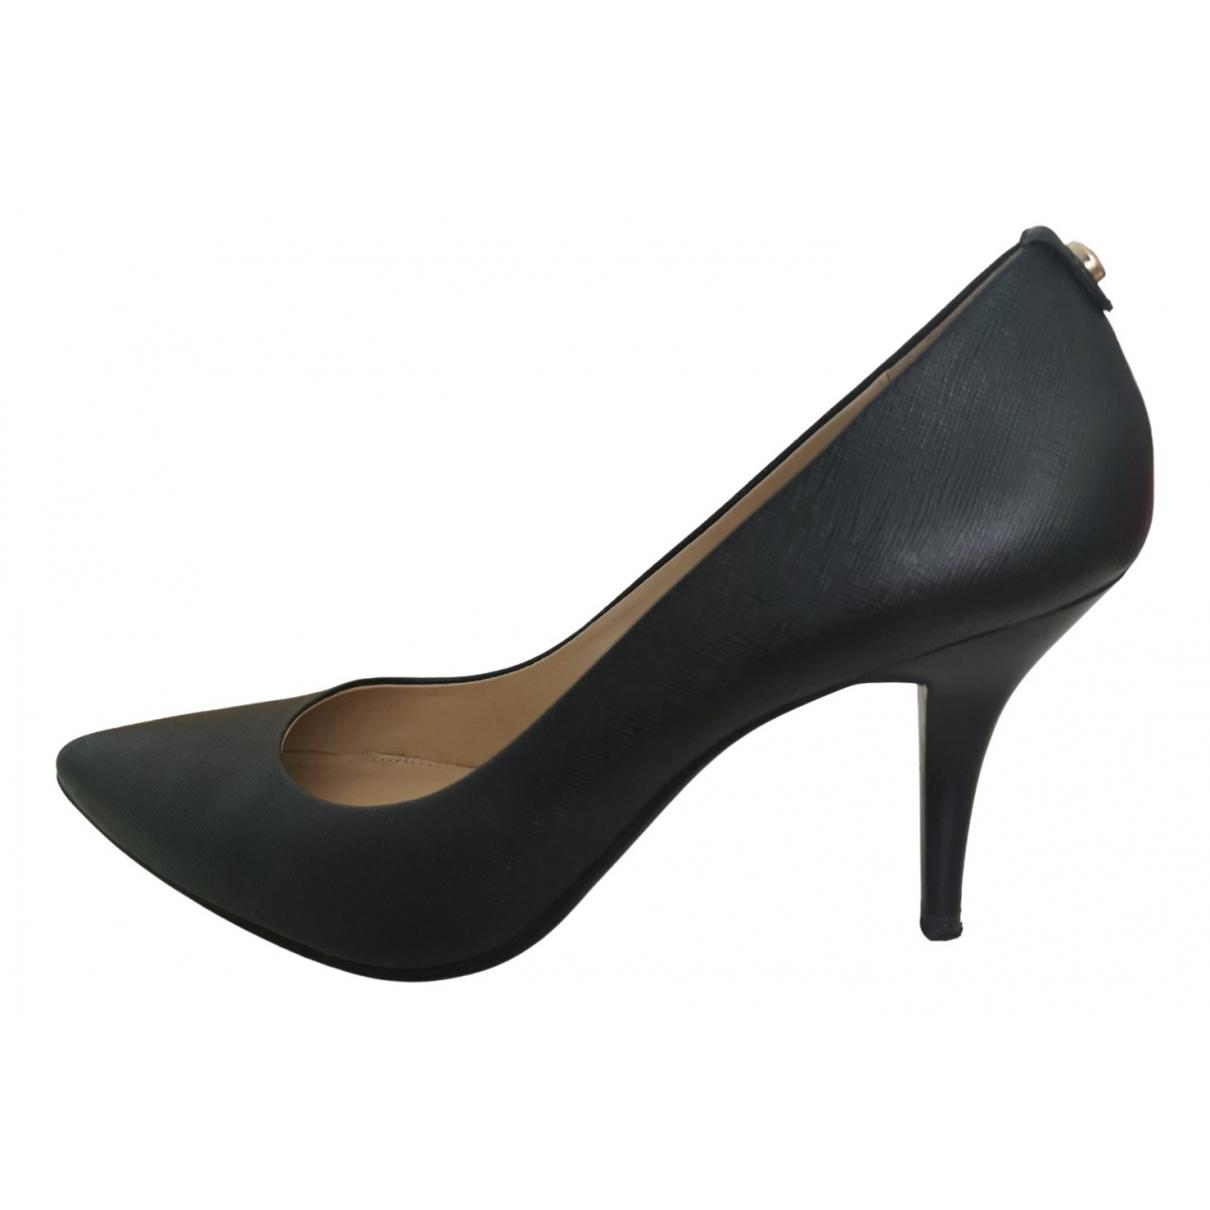 Michael Kors \N Black Leather Heels for Women 38 EU